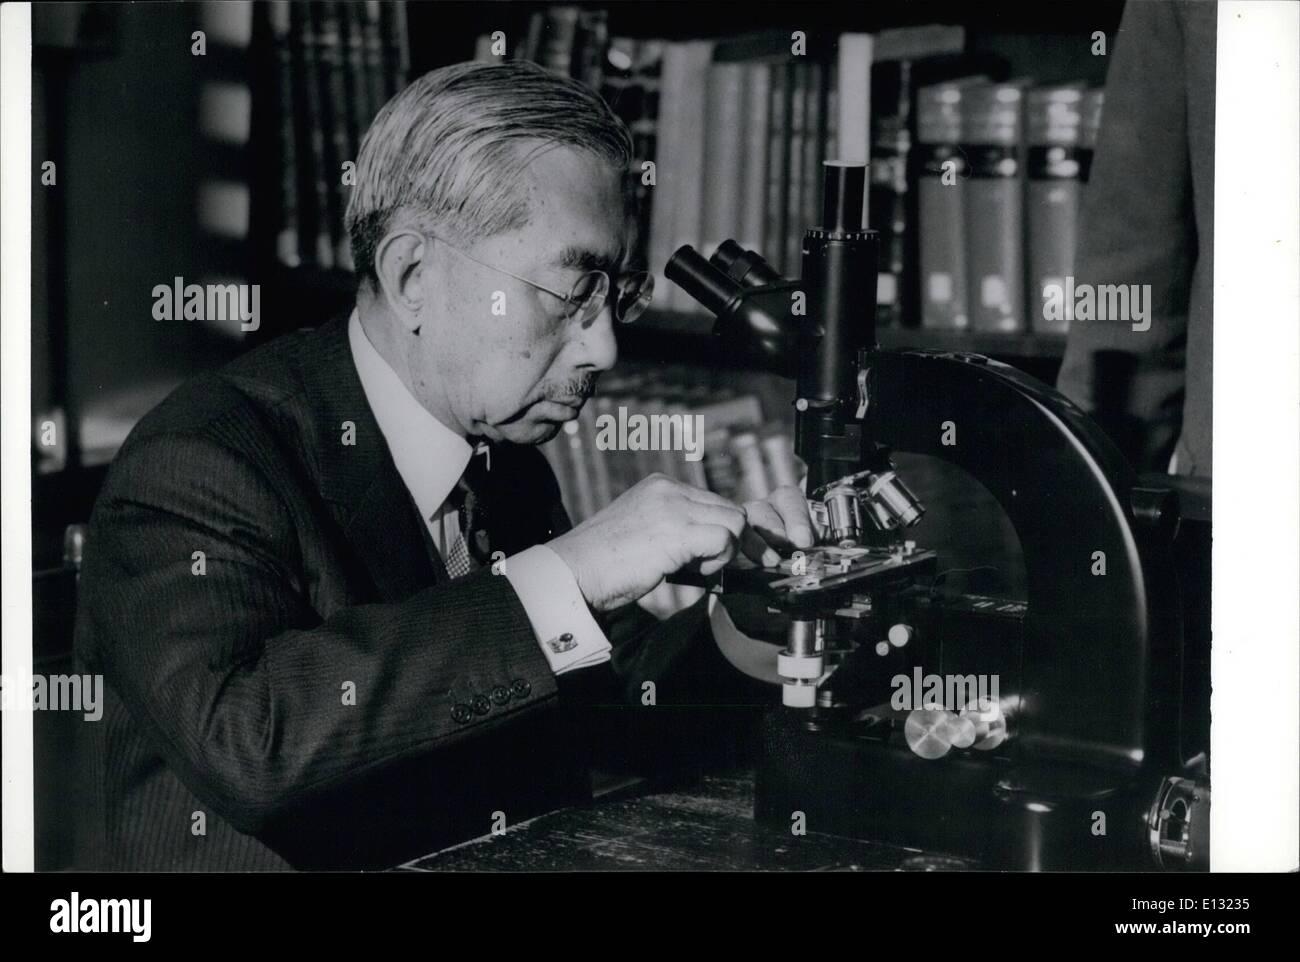 Feb. 26, 2012 - Emperor Hirohito celebrates his 72 birthday on April 29, 1973. Emperor Hirohito studying marine micro-organisms - Stock Image